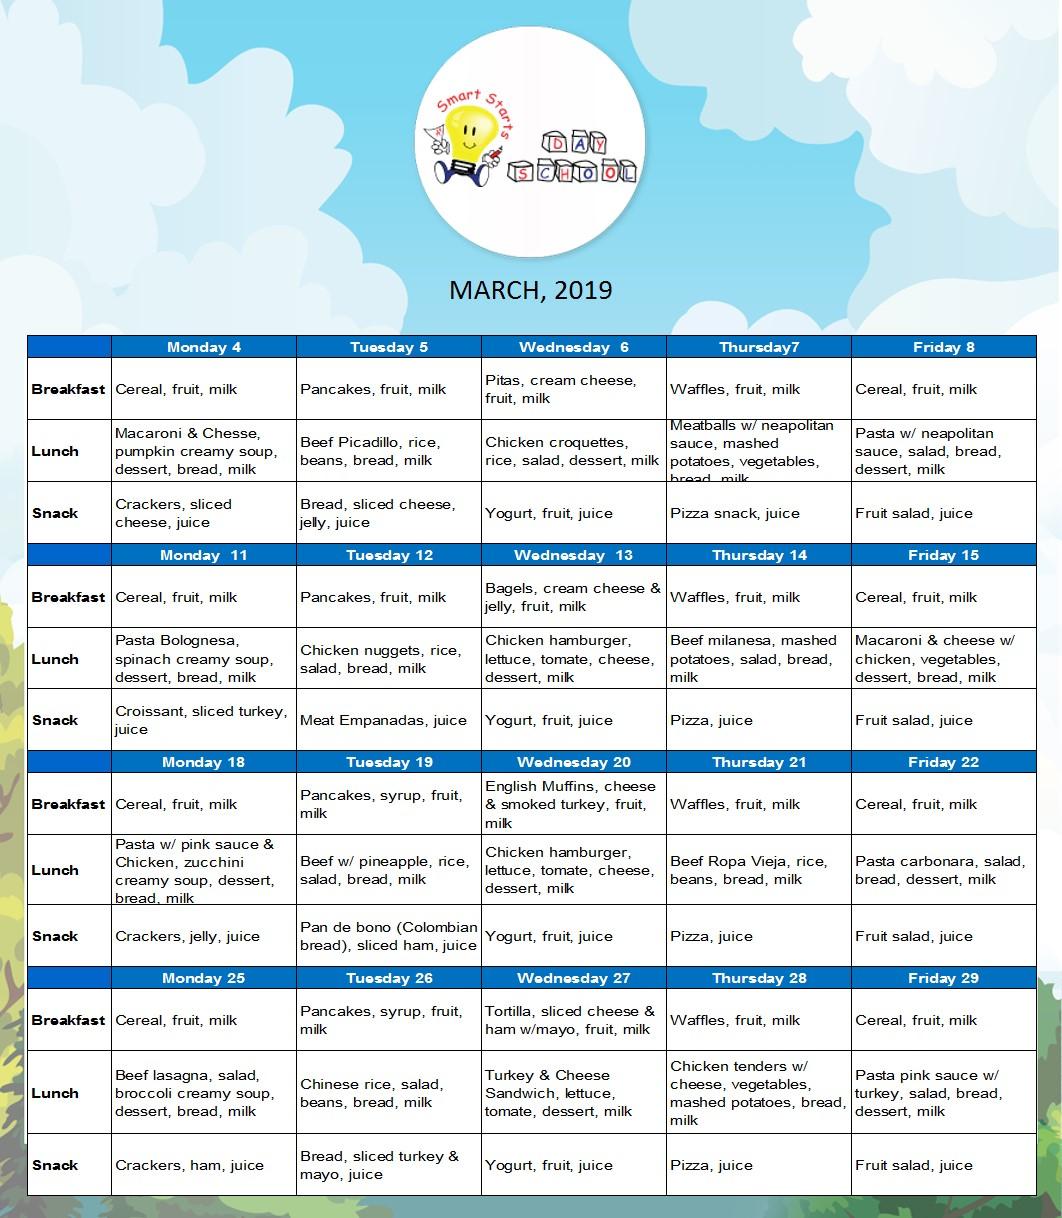 menu-mar-2019-ssds.jpg